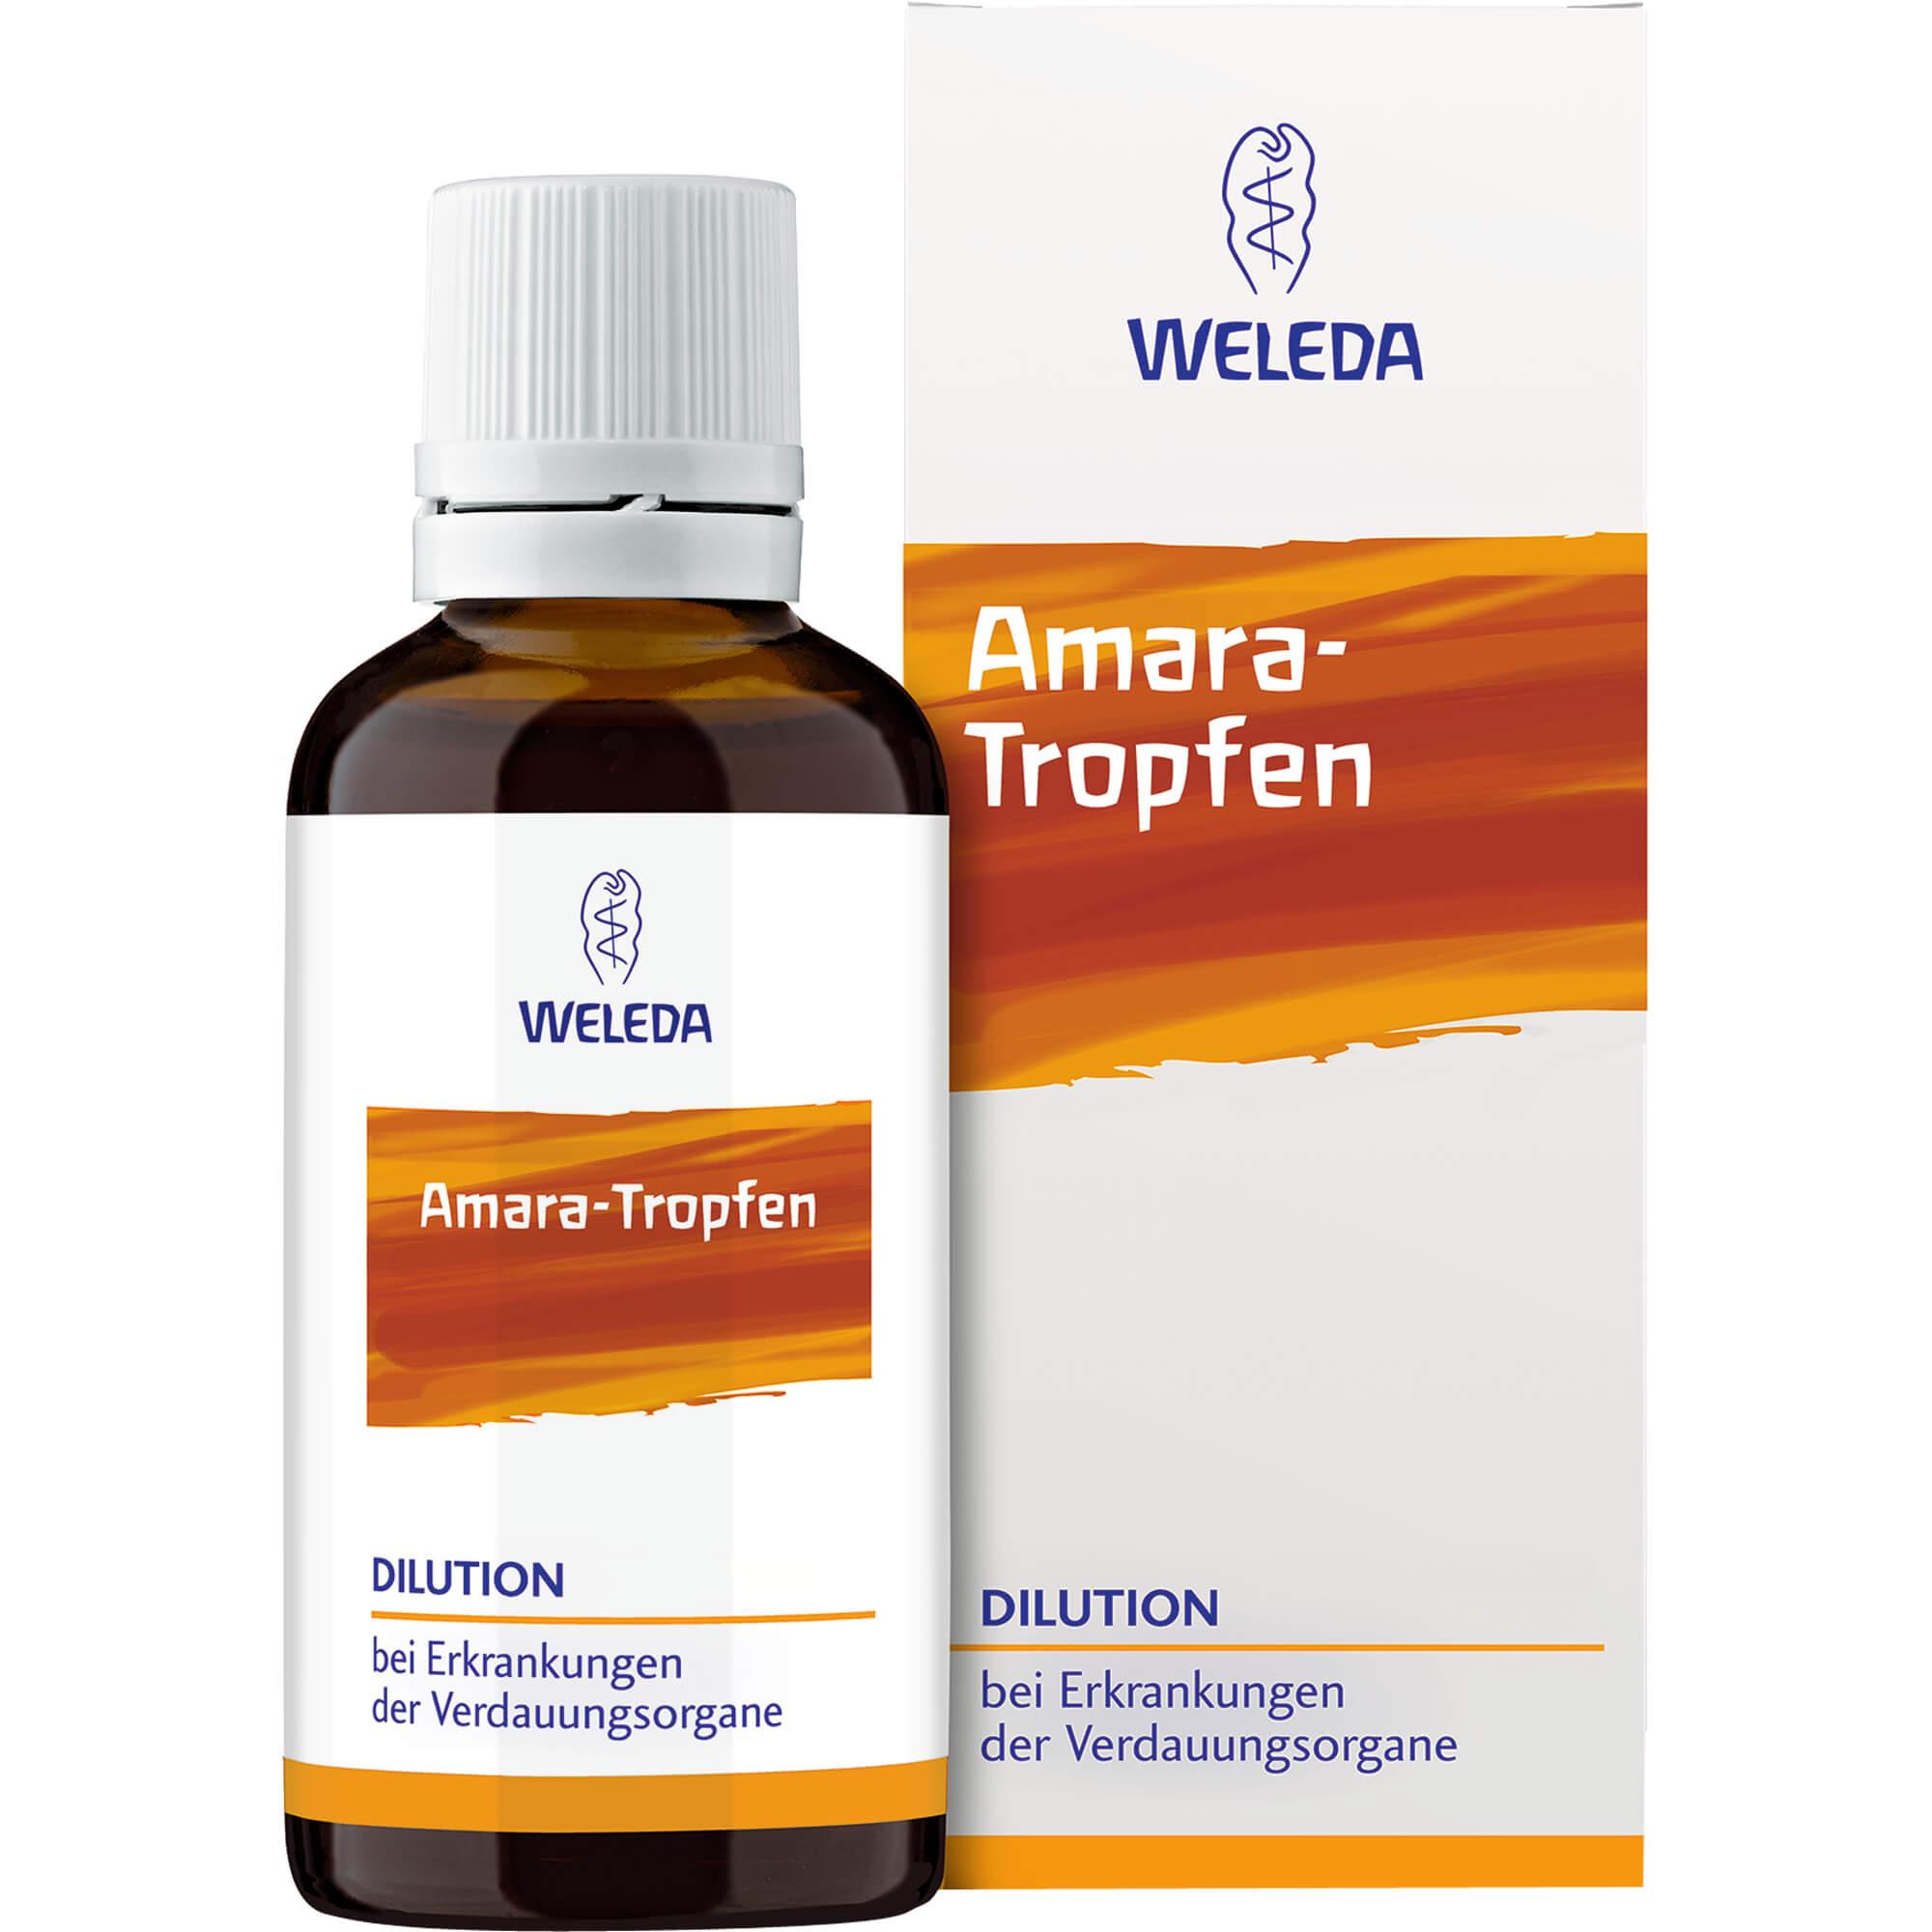 AMARA Tropfen Dilution